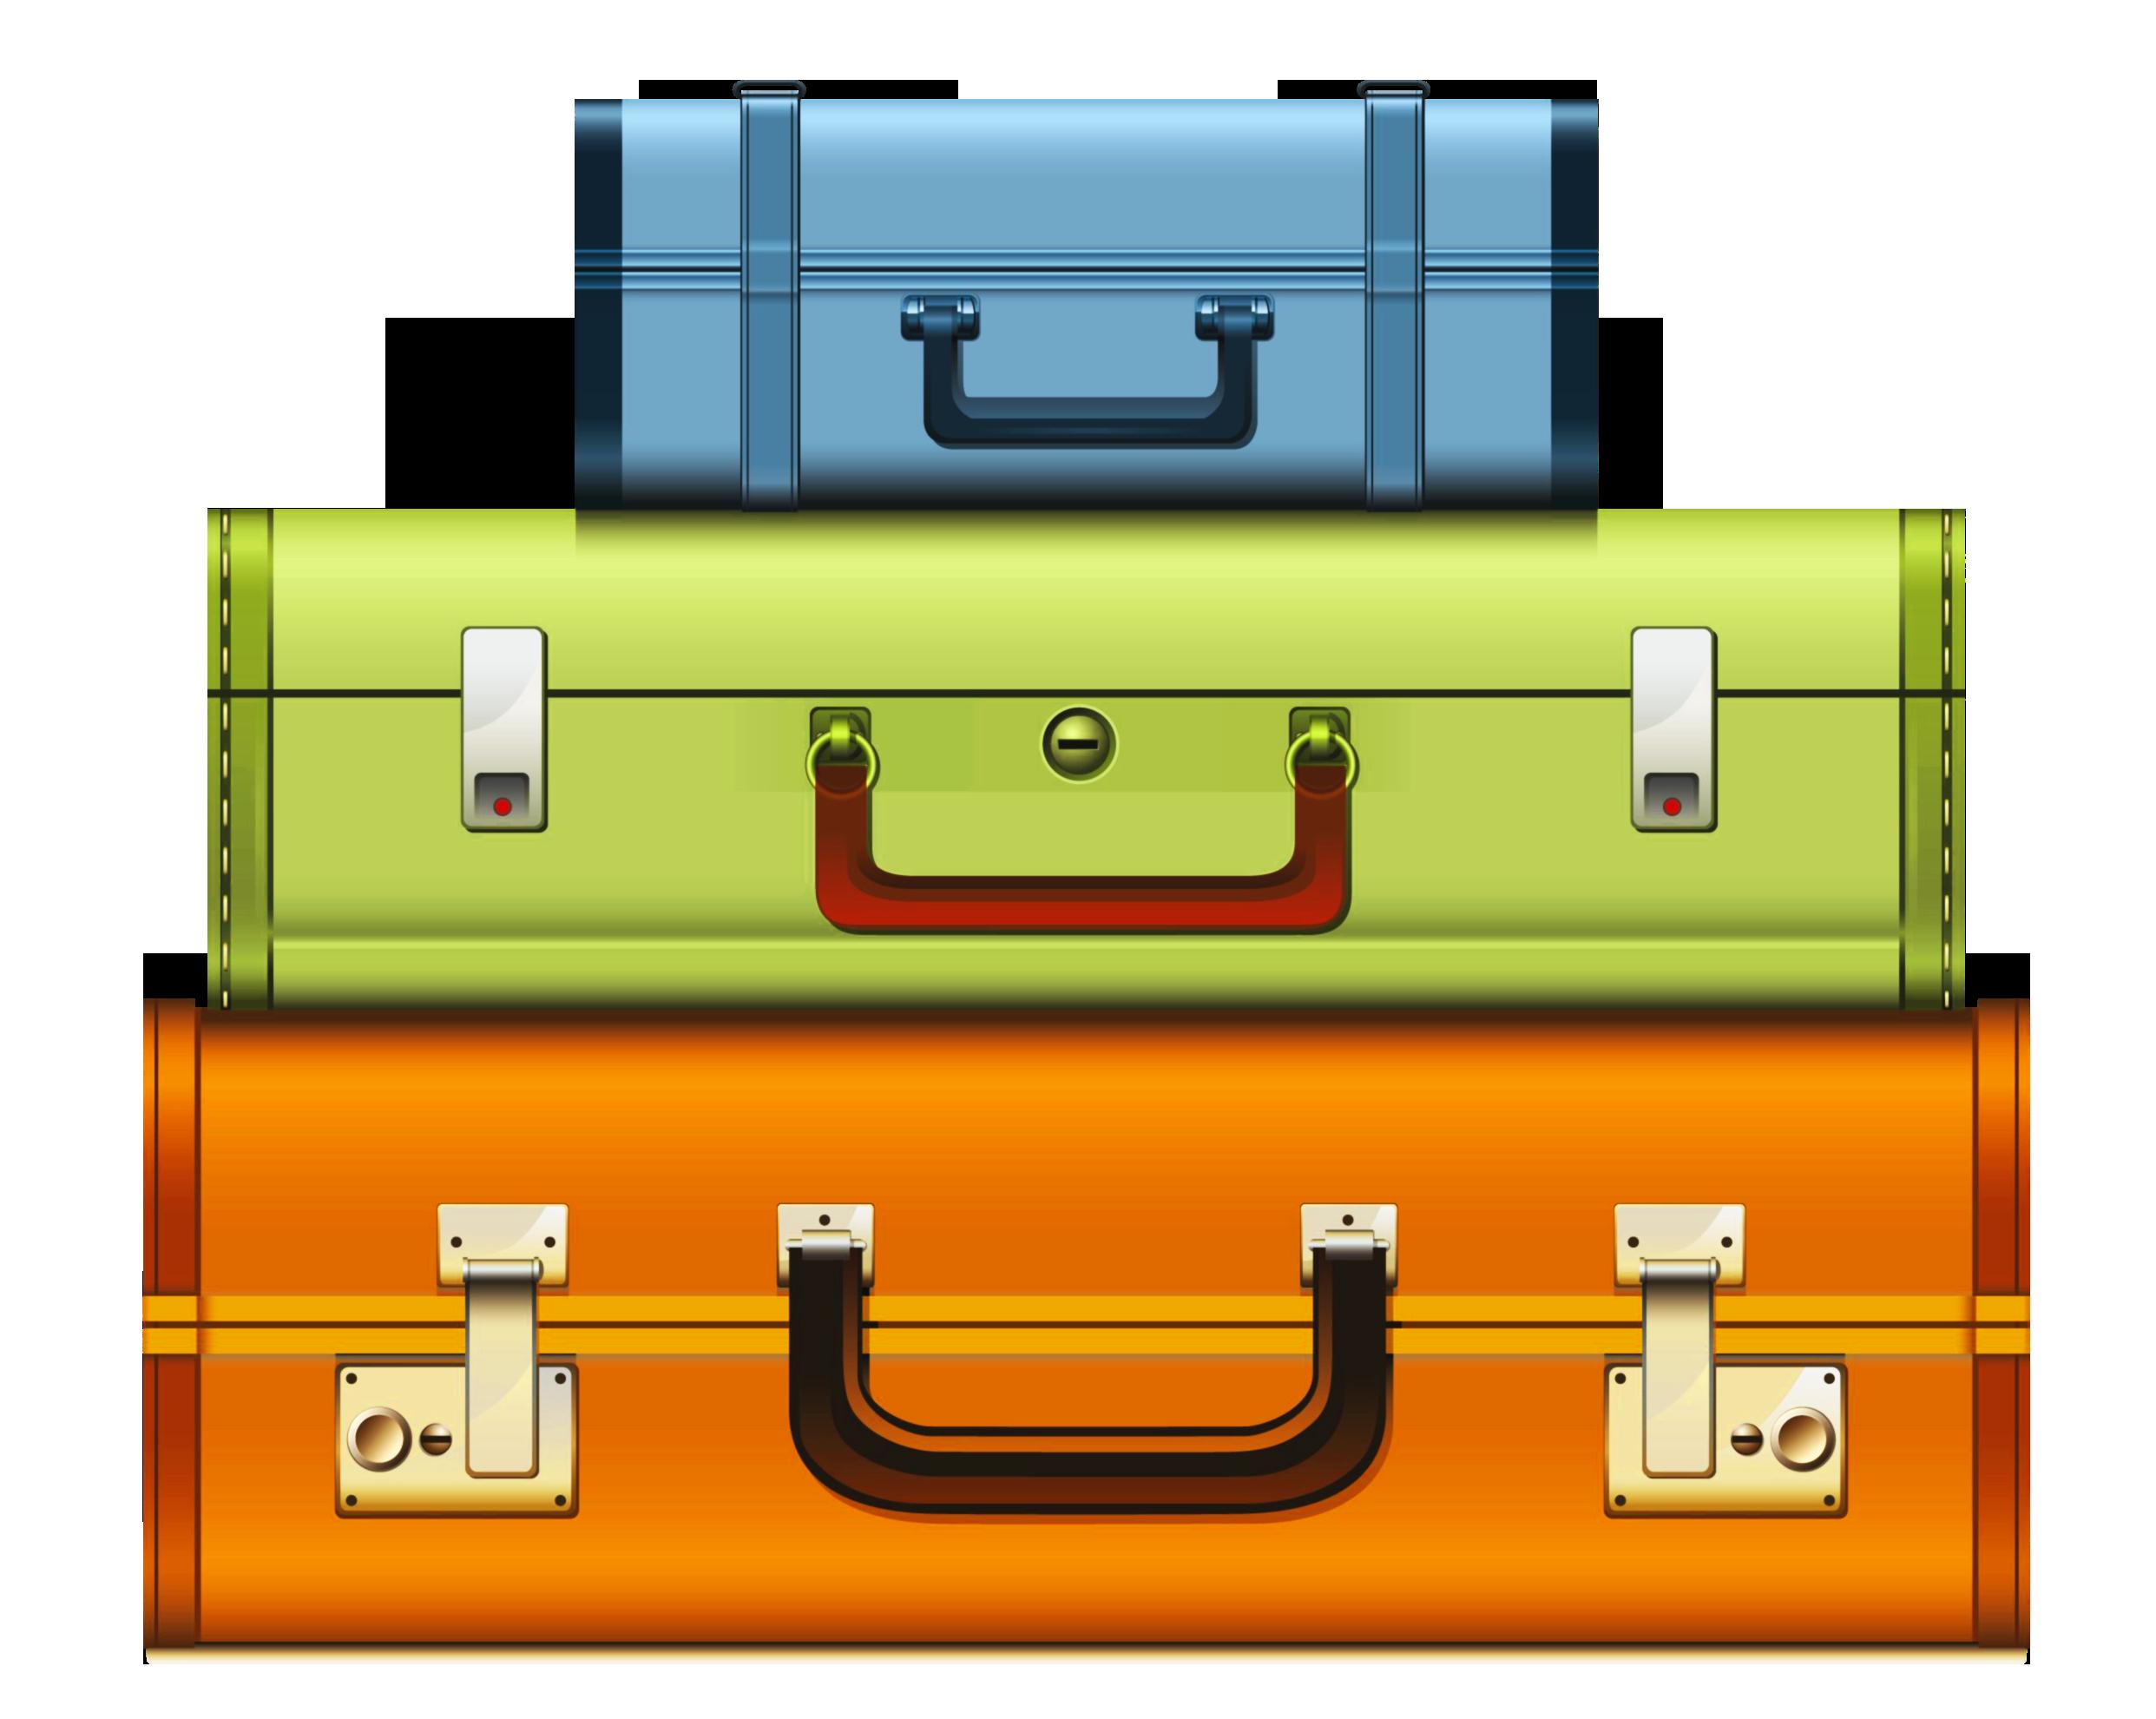 2484x1980 Suitcase Clipart No Background Clipartfox